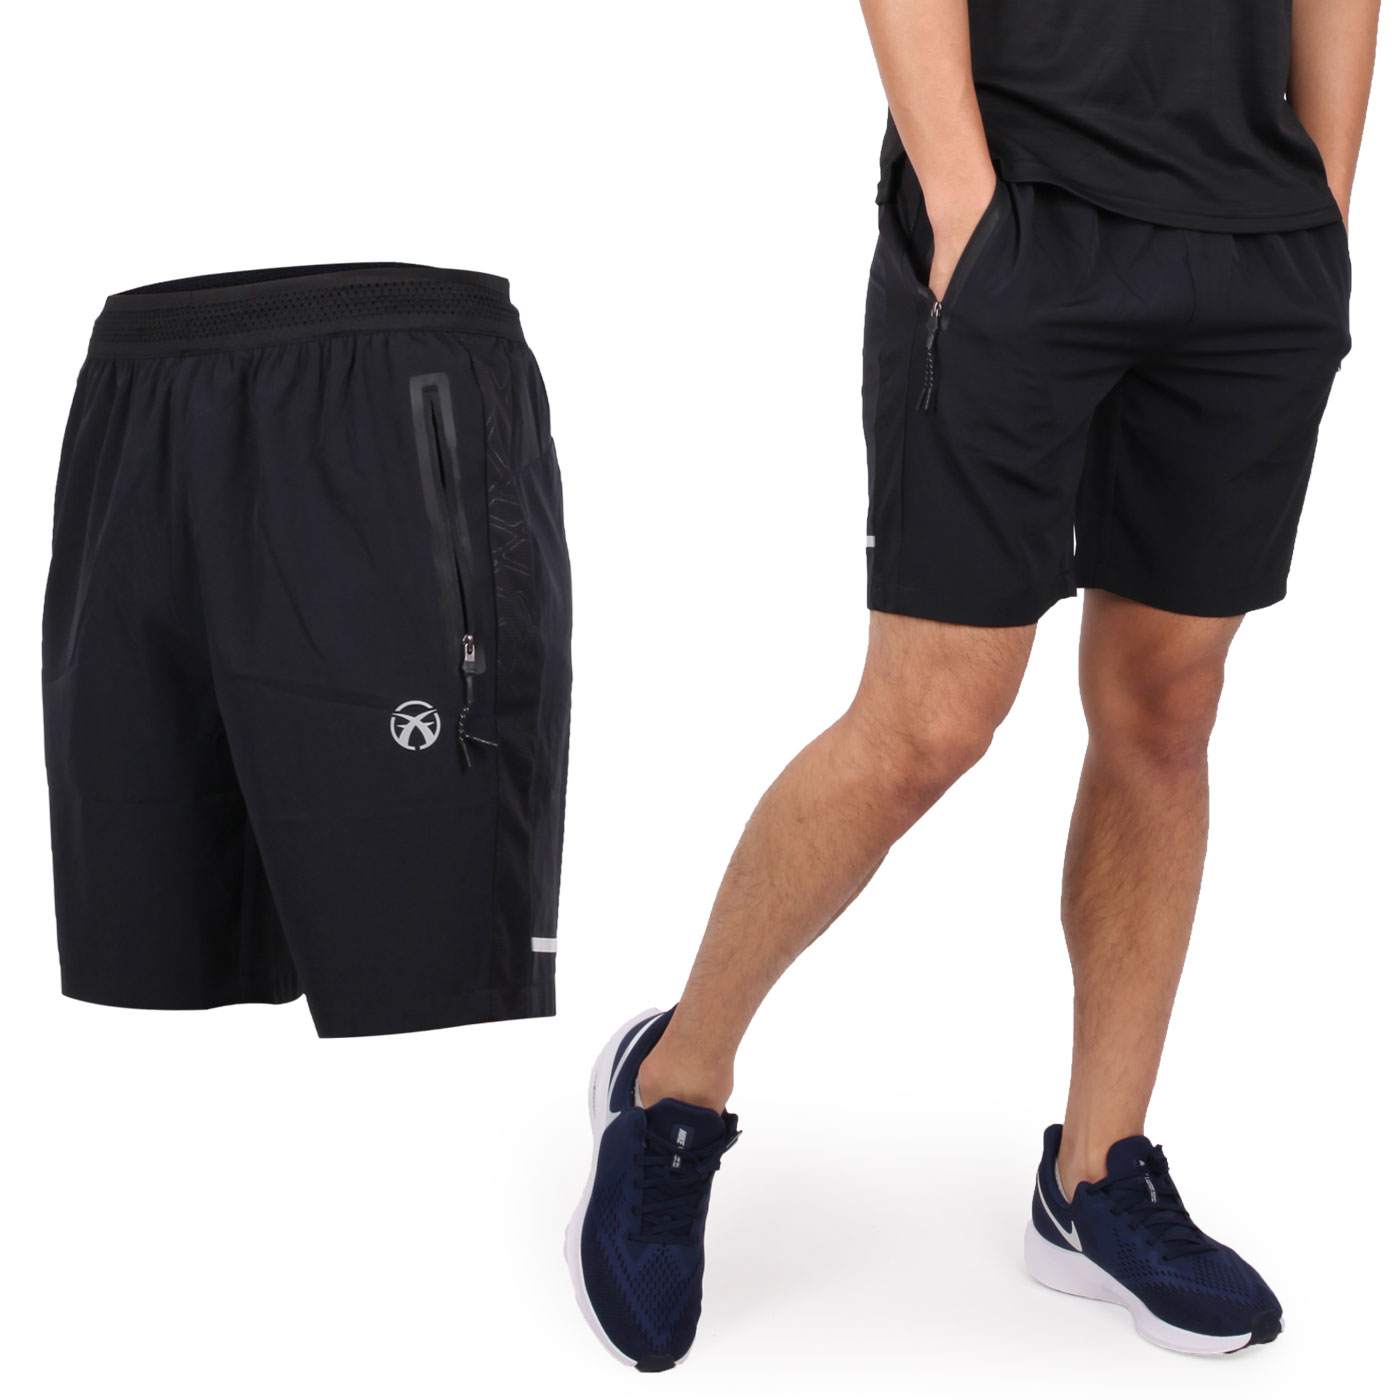 FIRESTAR 男款彈性平織短褲 C9219-10 - 黑銀